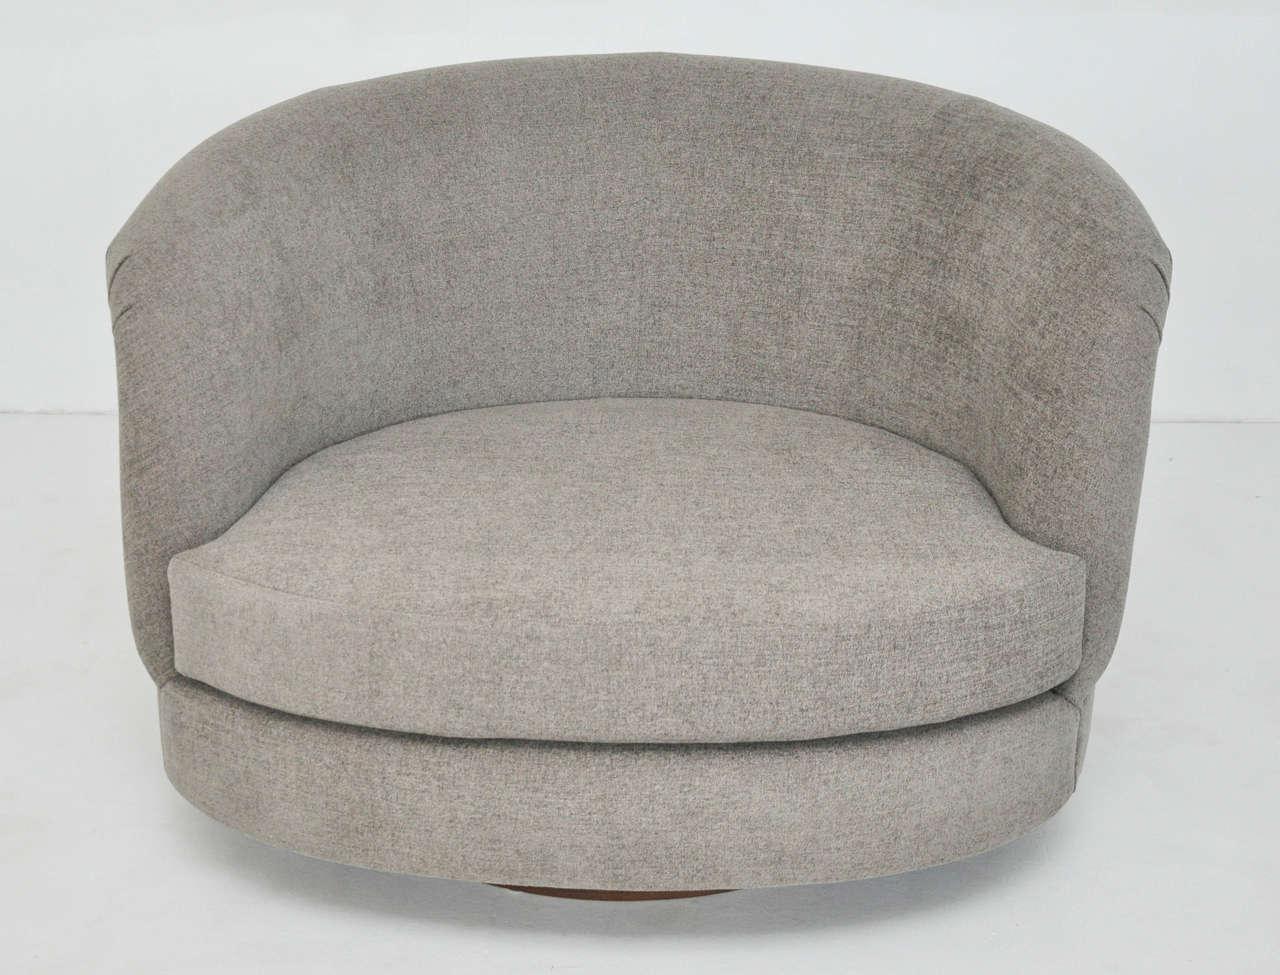 Pair of Large Milo Baughman Swivel Chairs 9